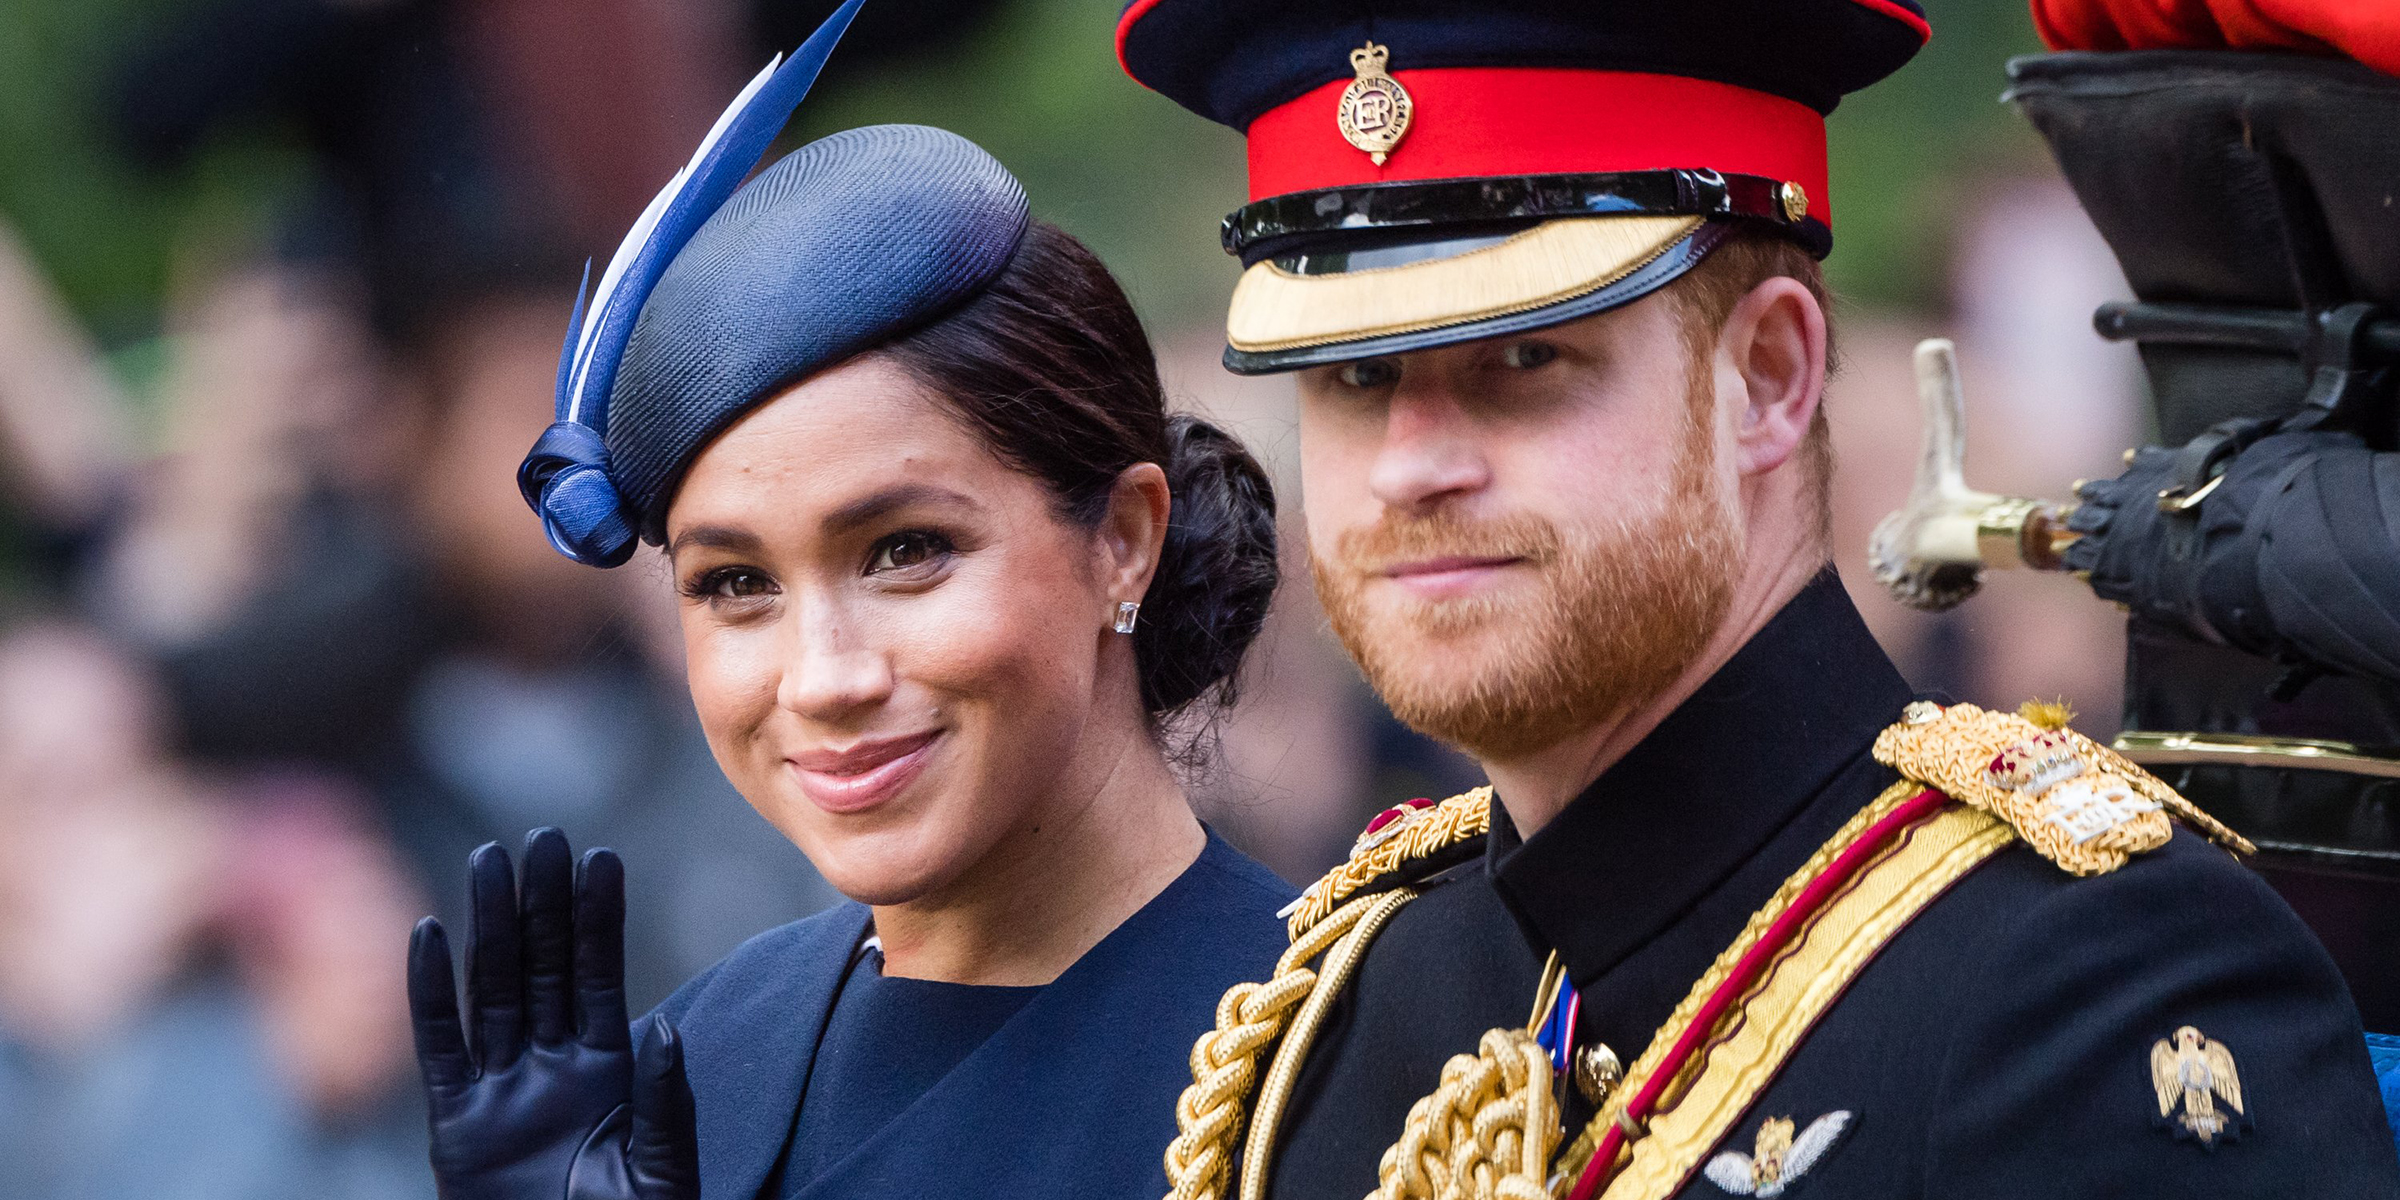 Prince Harry breaks silence on royal exit, defends Meghan Markle